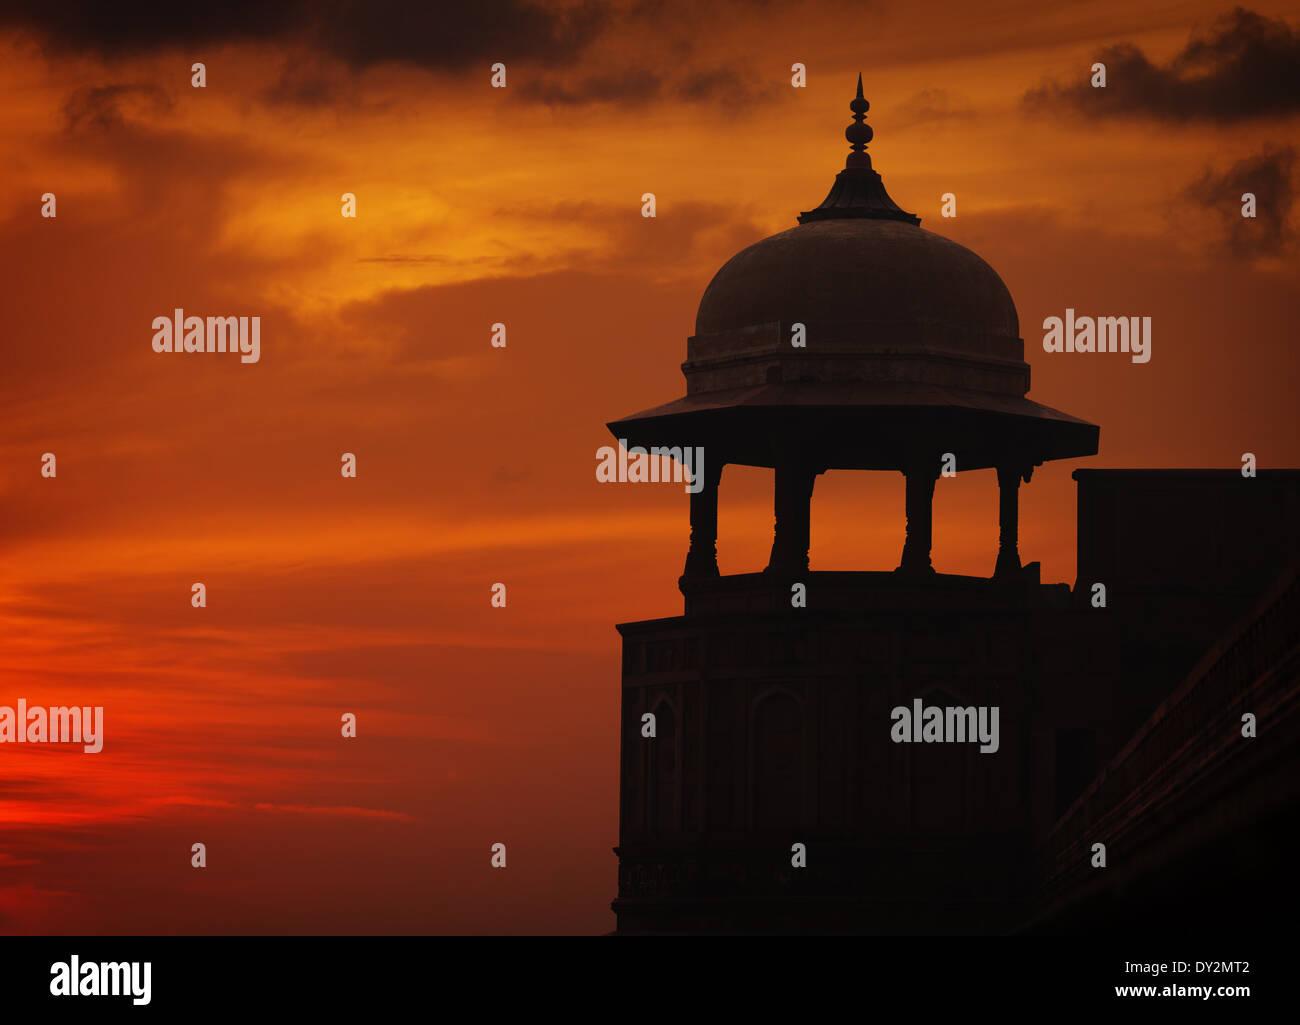 Silueta de torre de estilo asiático en sunset sky de fondo rojo, Ford, Agra, India Imagen De Stock